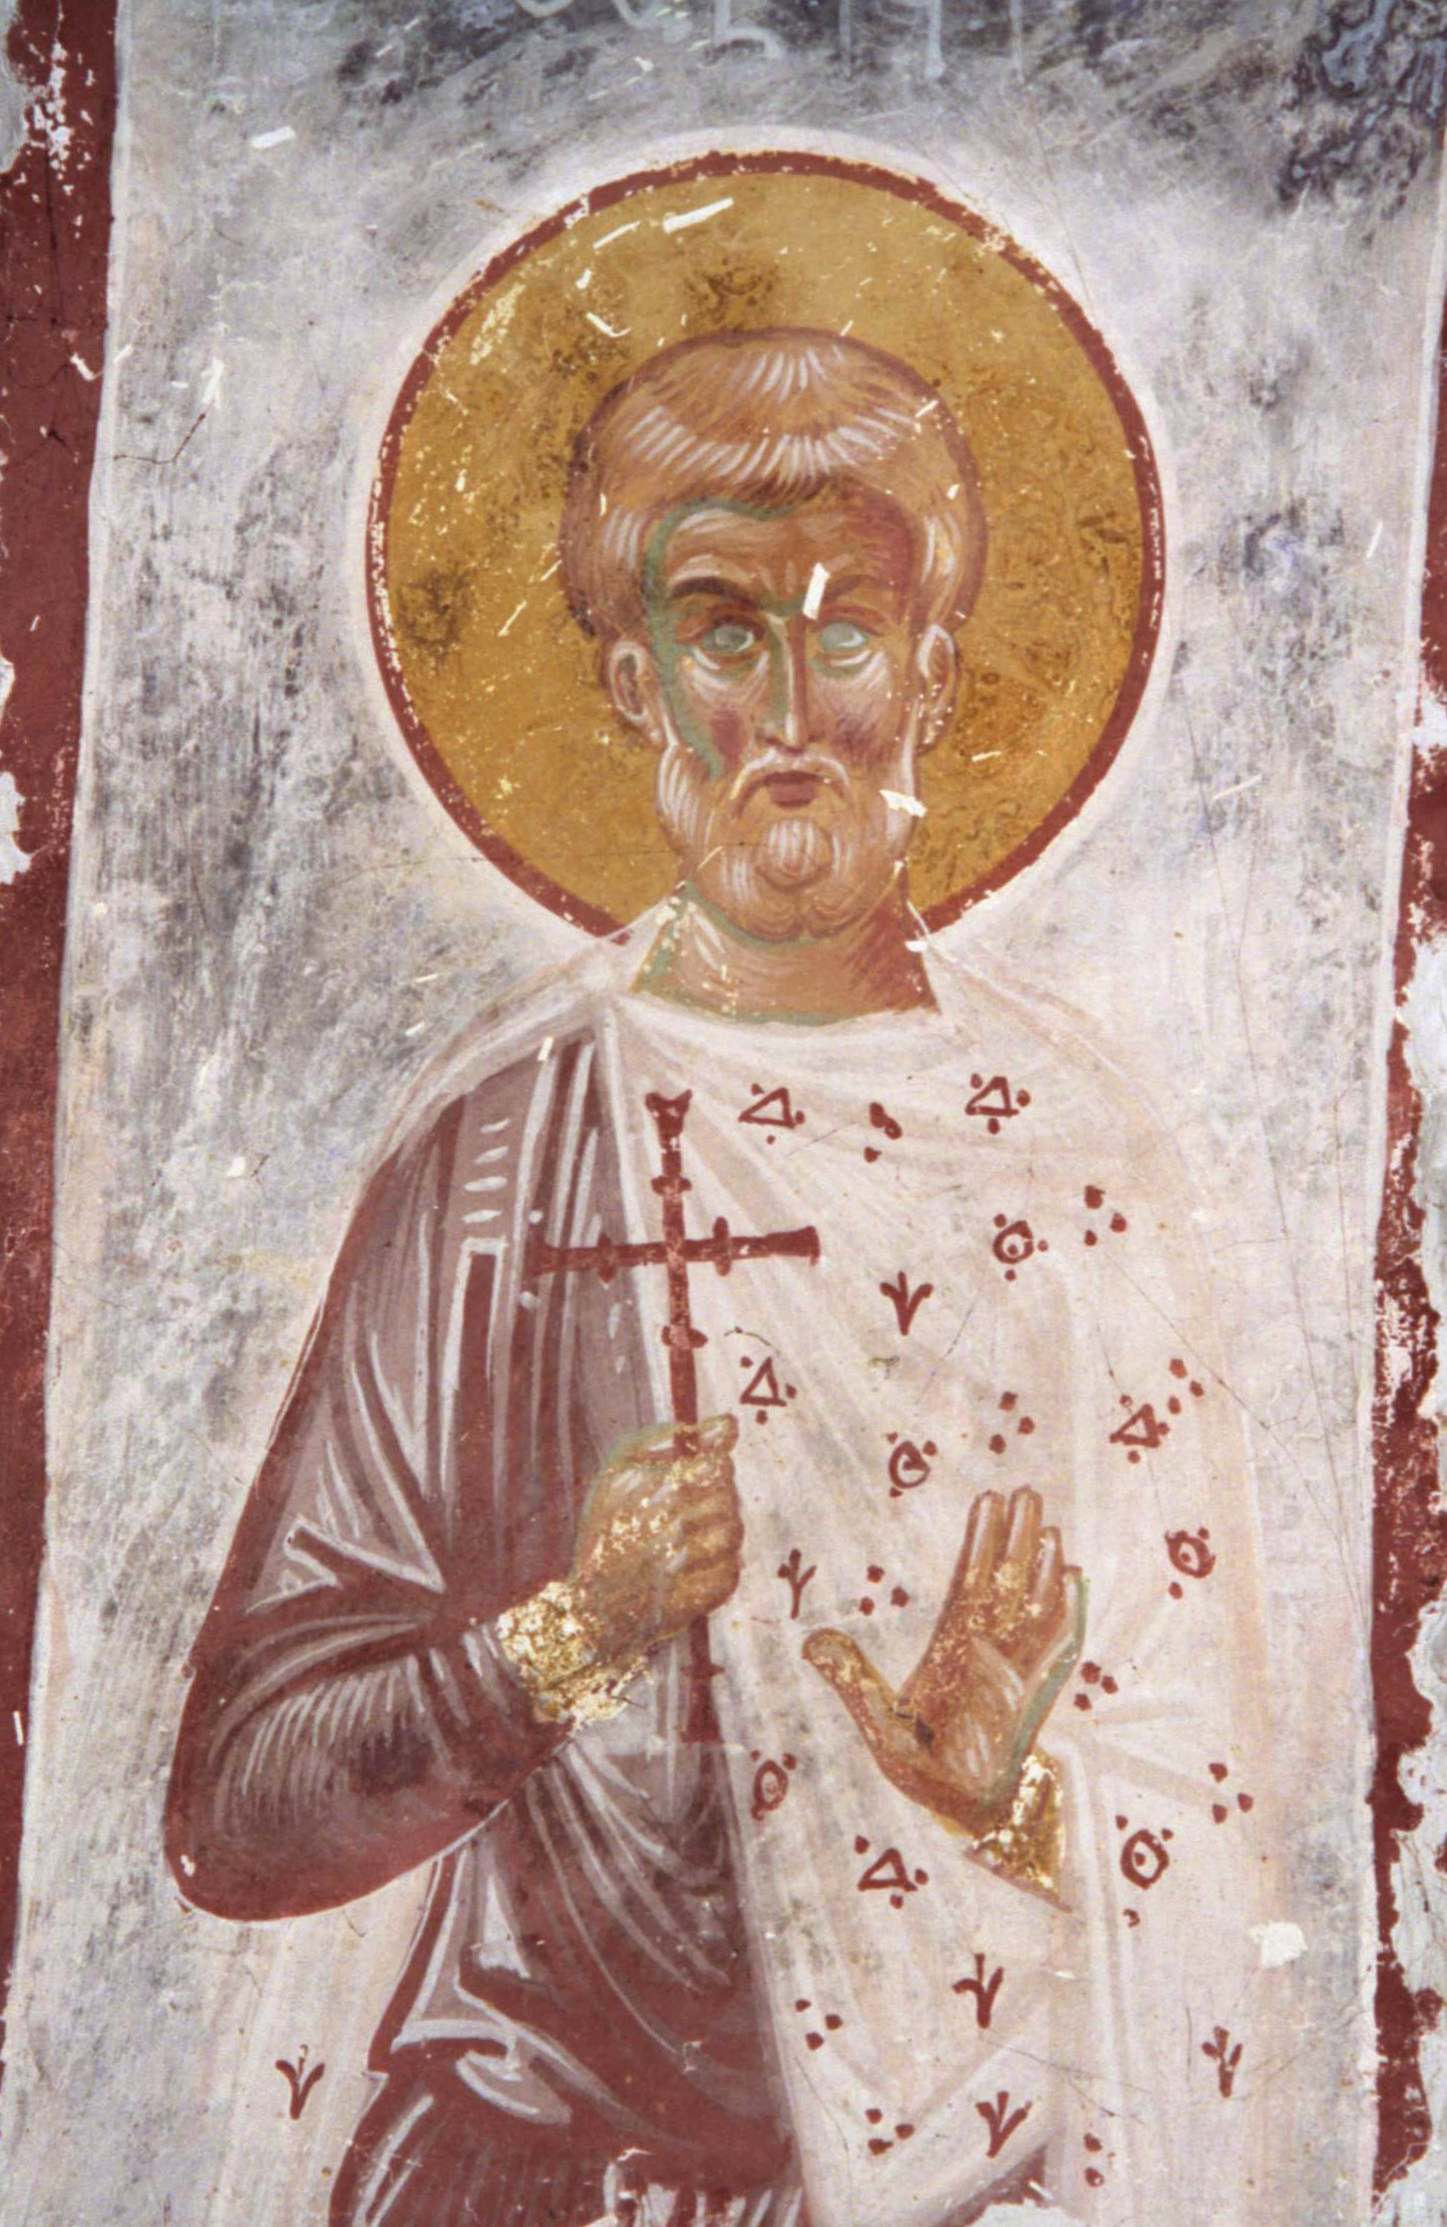 Святой мученик Зотик. Фреска собора Христа Спасителя в Цаленджихе, Грузия. XIV век.